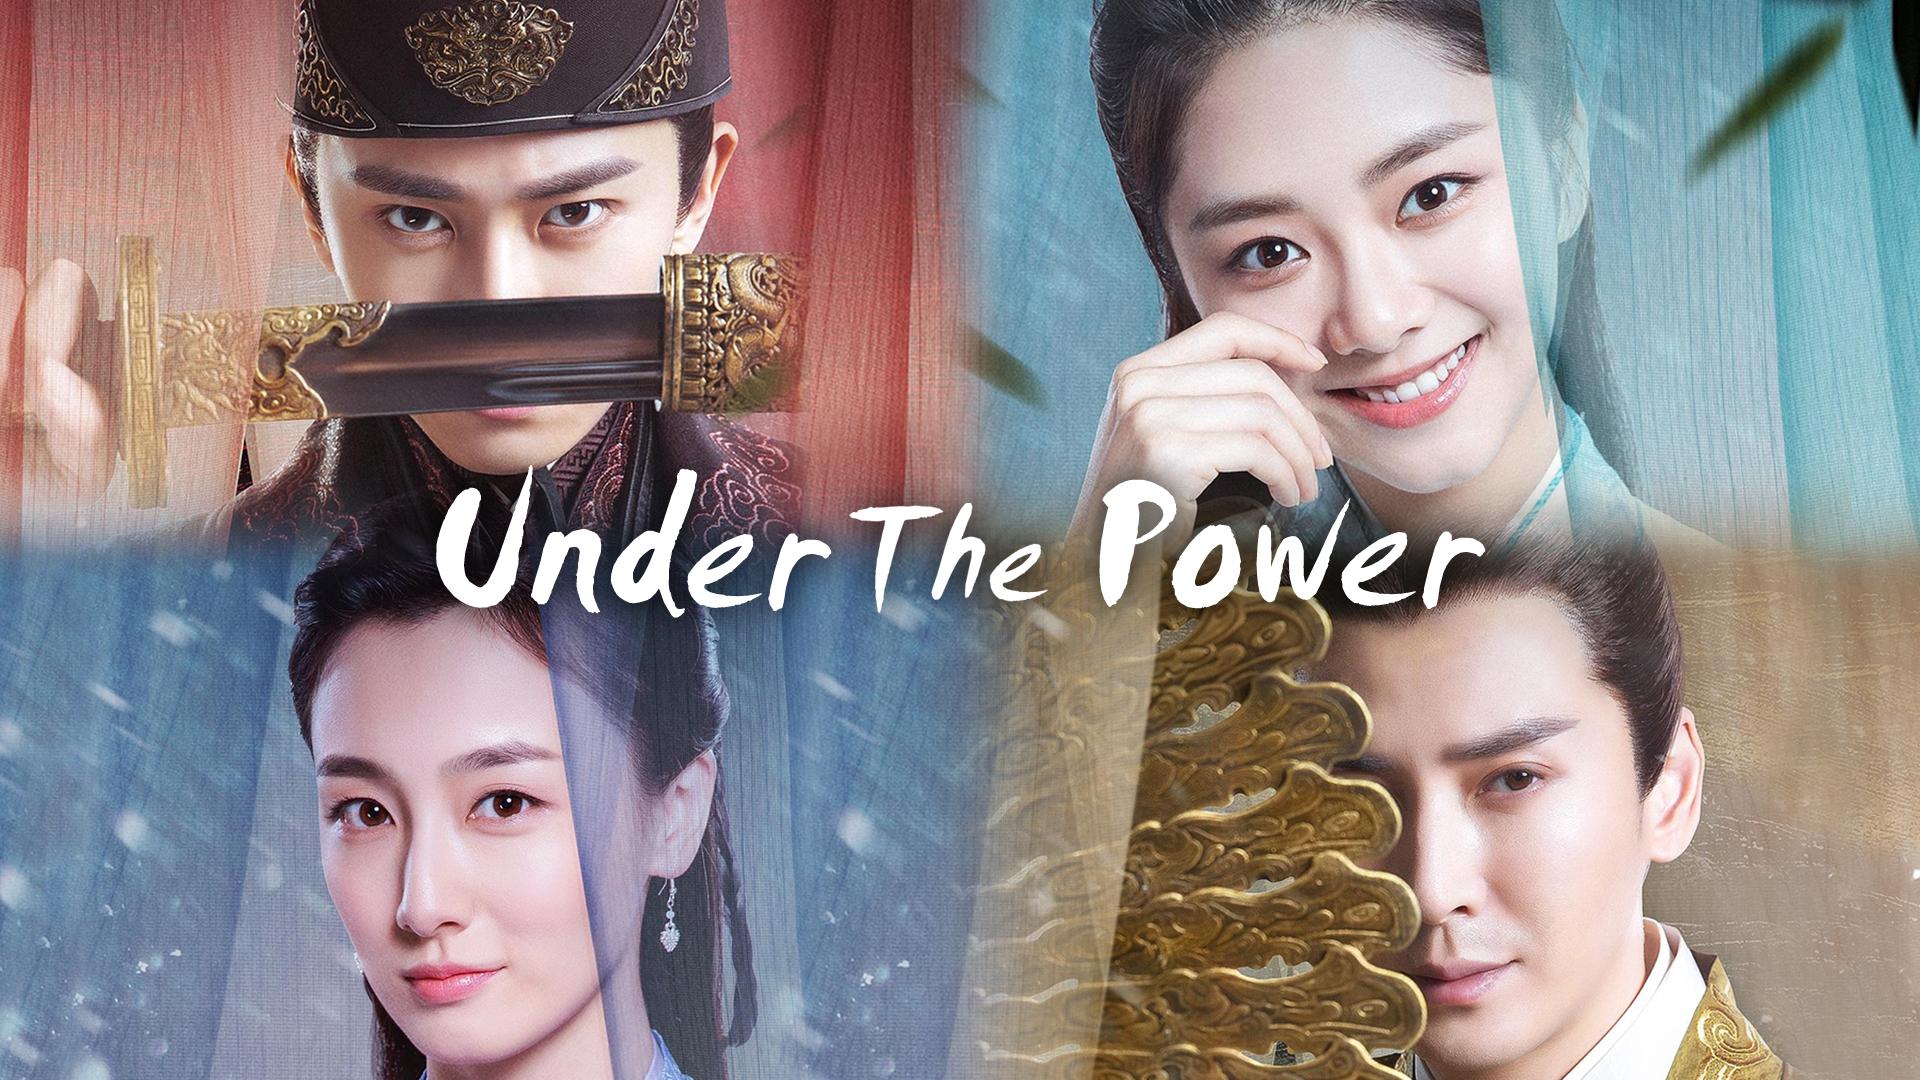 Under the Power